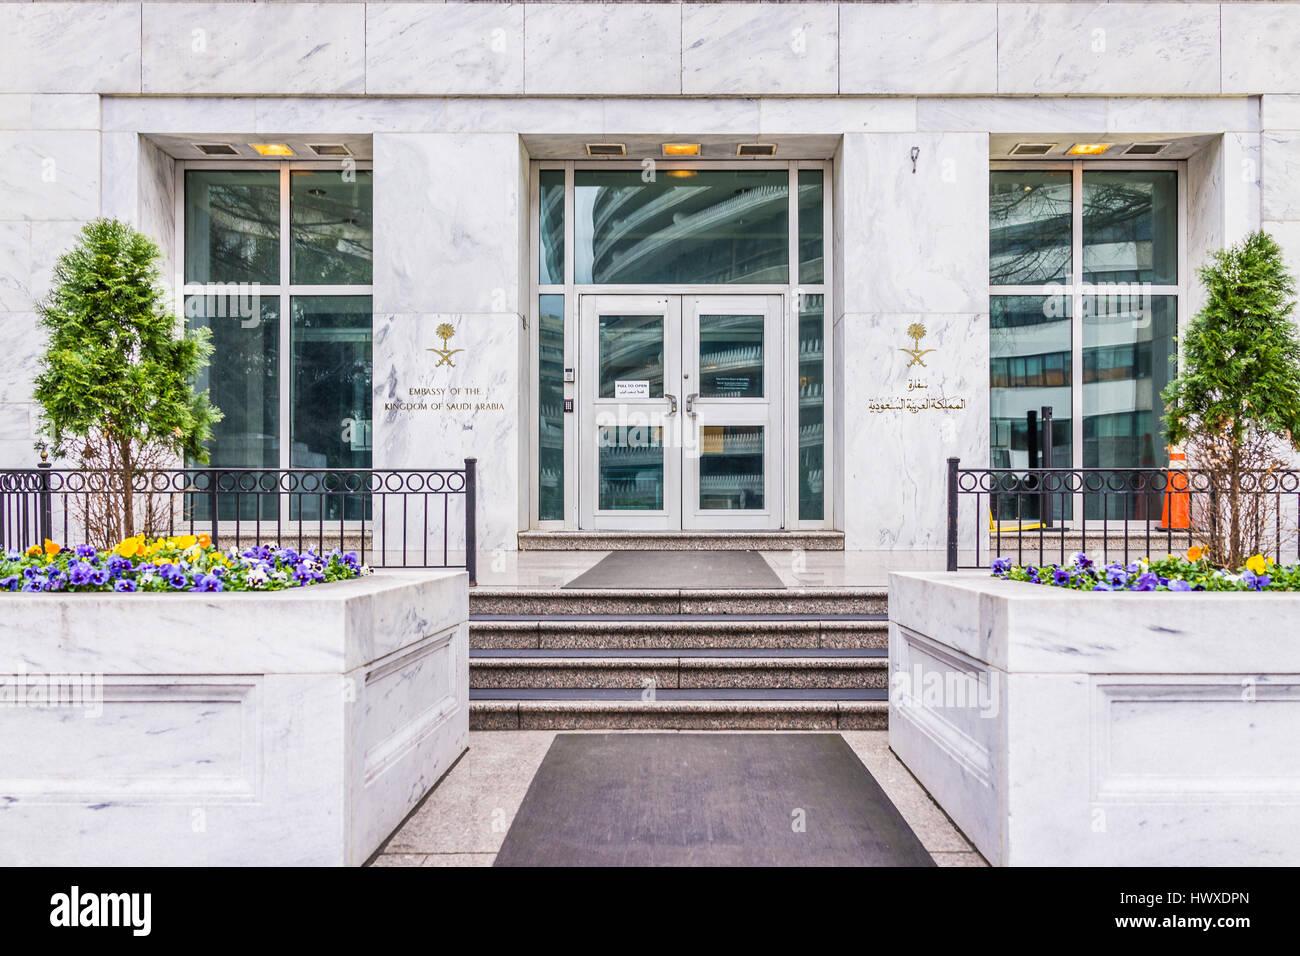 Washington DC, USA - March 20, 2017: Saudi Arabia embassy entrance with sign - Stock Image